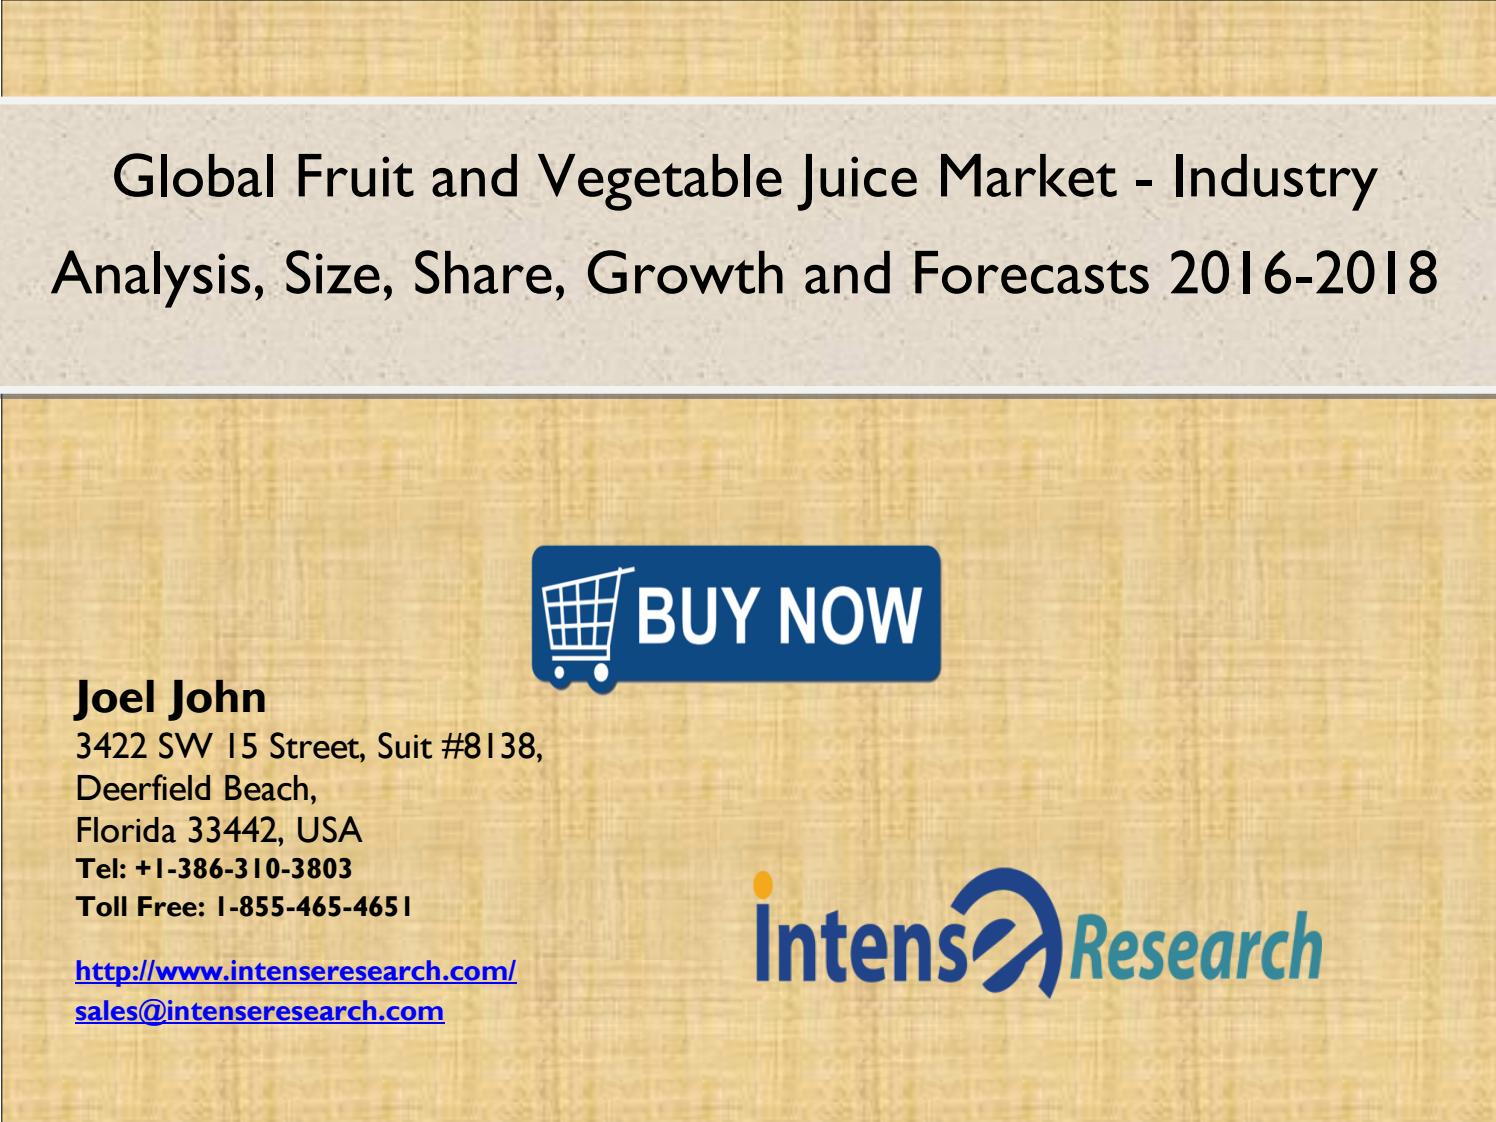 Global Fruit and Vegetable Juice Market 2016: Industry Size